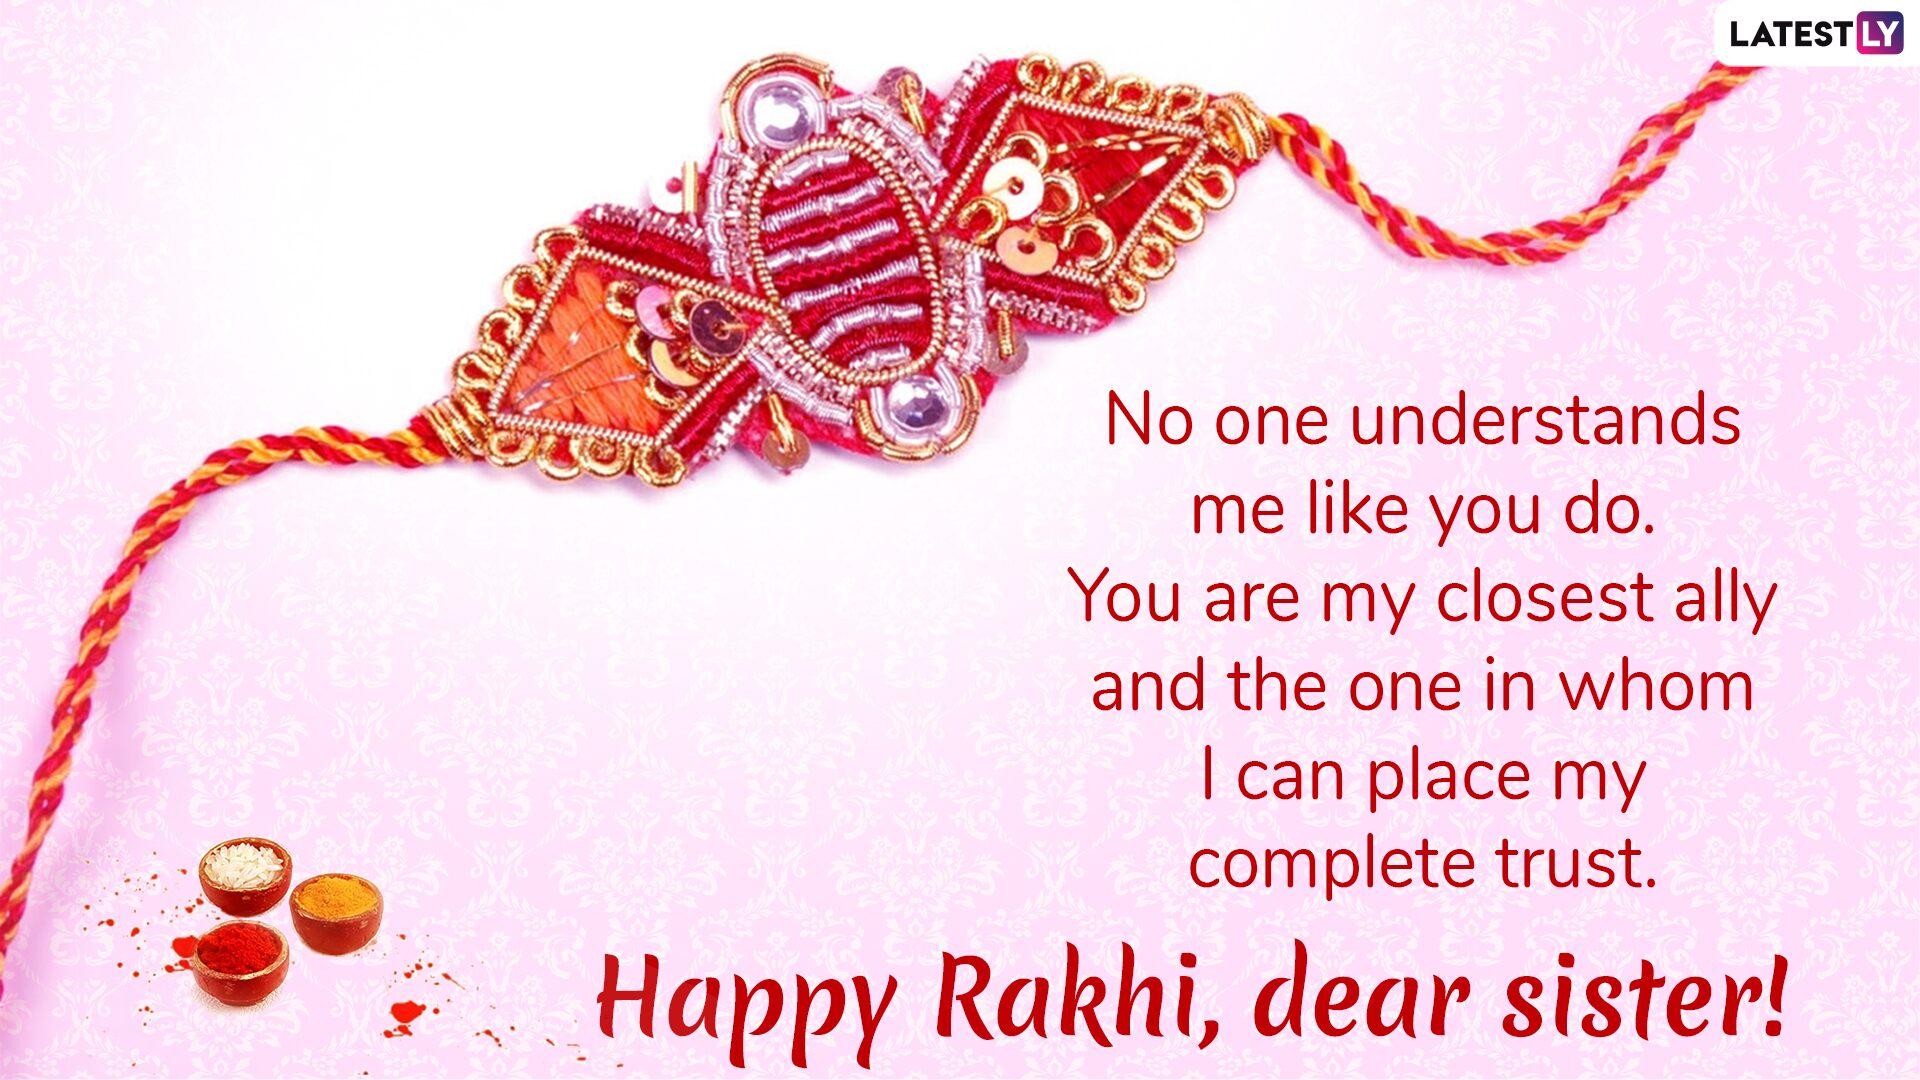 Happy Rakhi Wishes To Sister Pinterest thumbnail